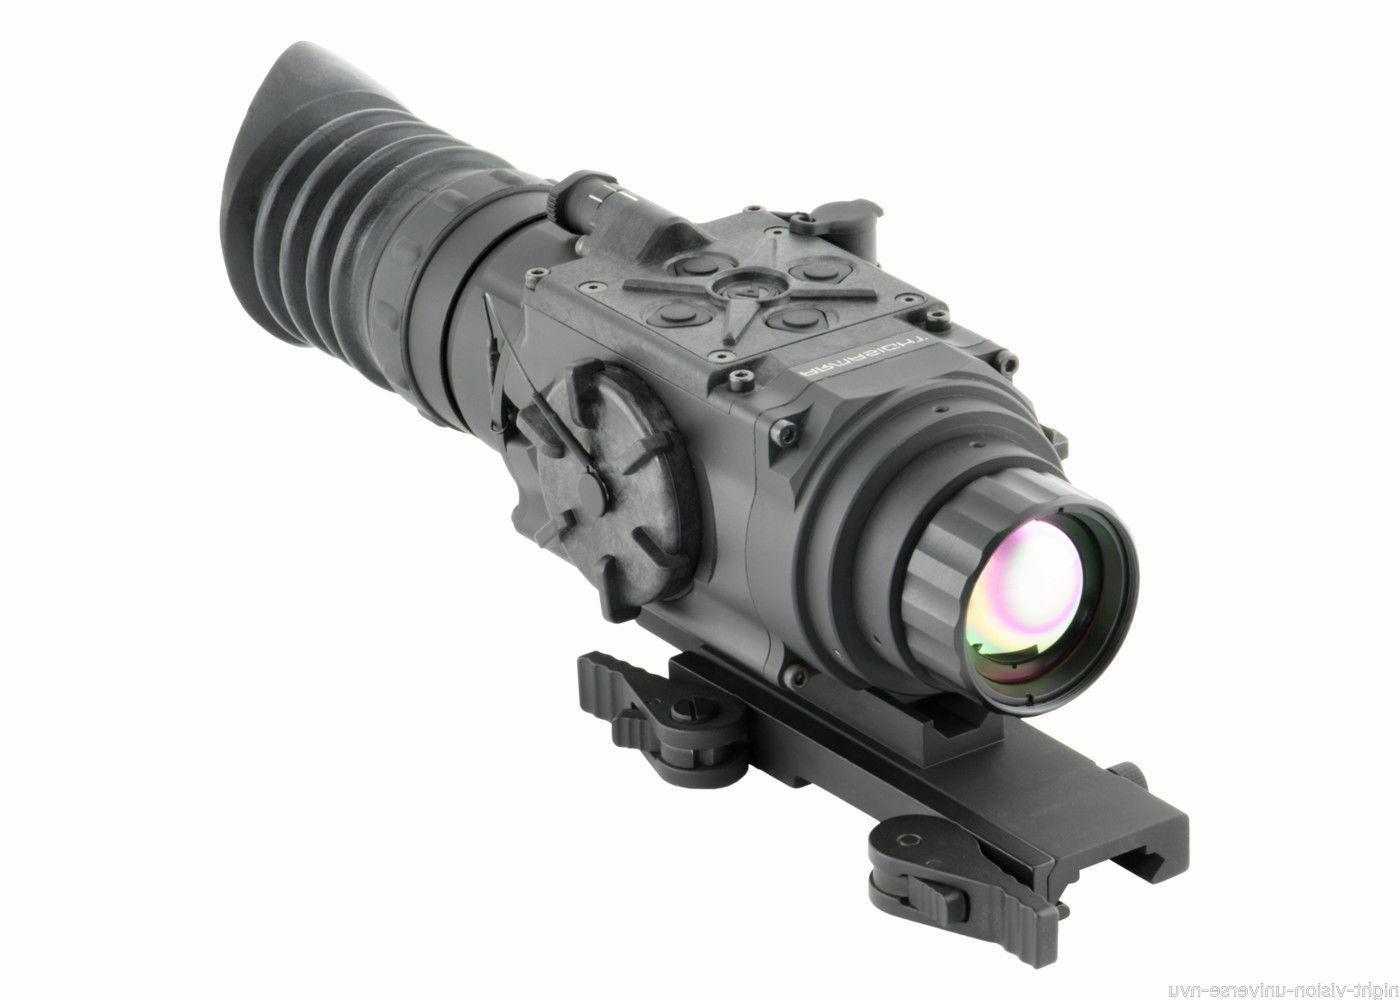 Armasight Predator 640 1 8x25 30Hz Thermal Imaging Weapon Si